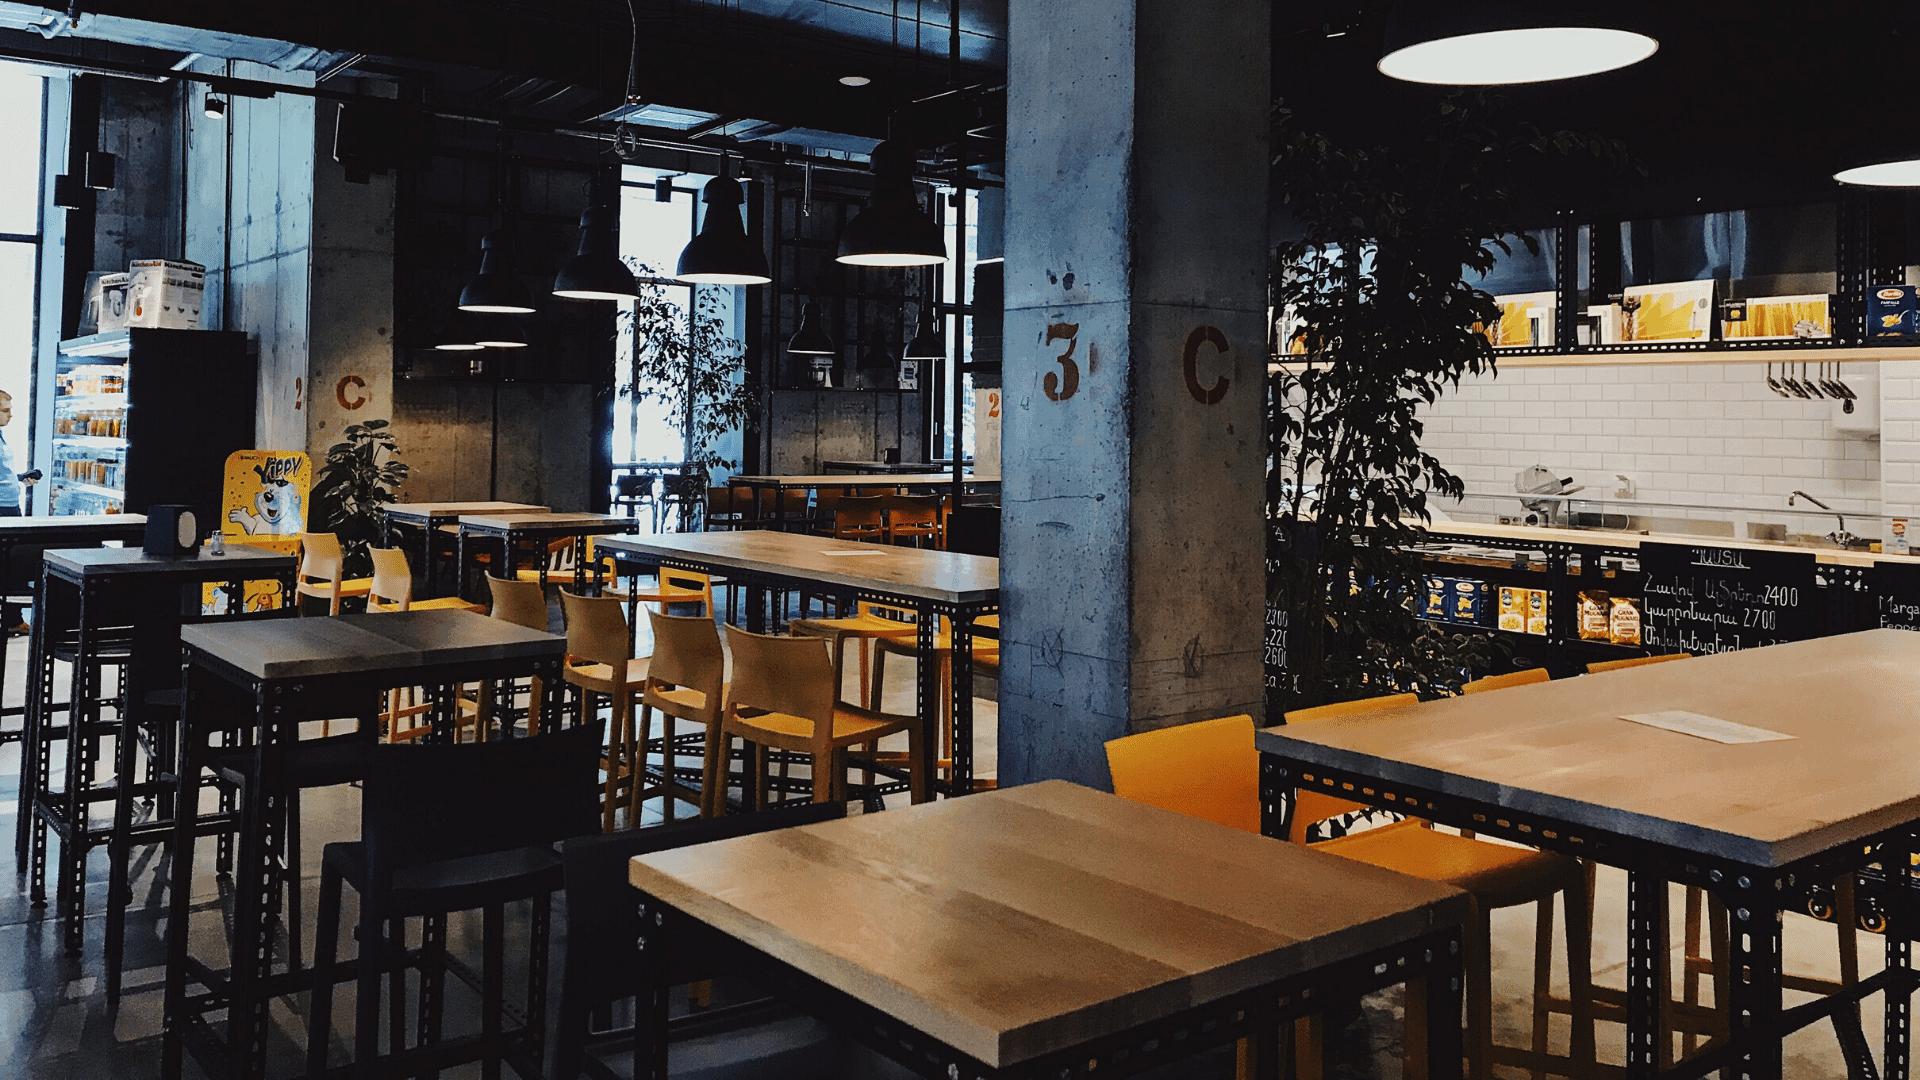 Restaurant Wallpaper Design - 1920x1080 - Download HD ...